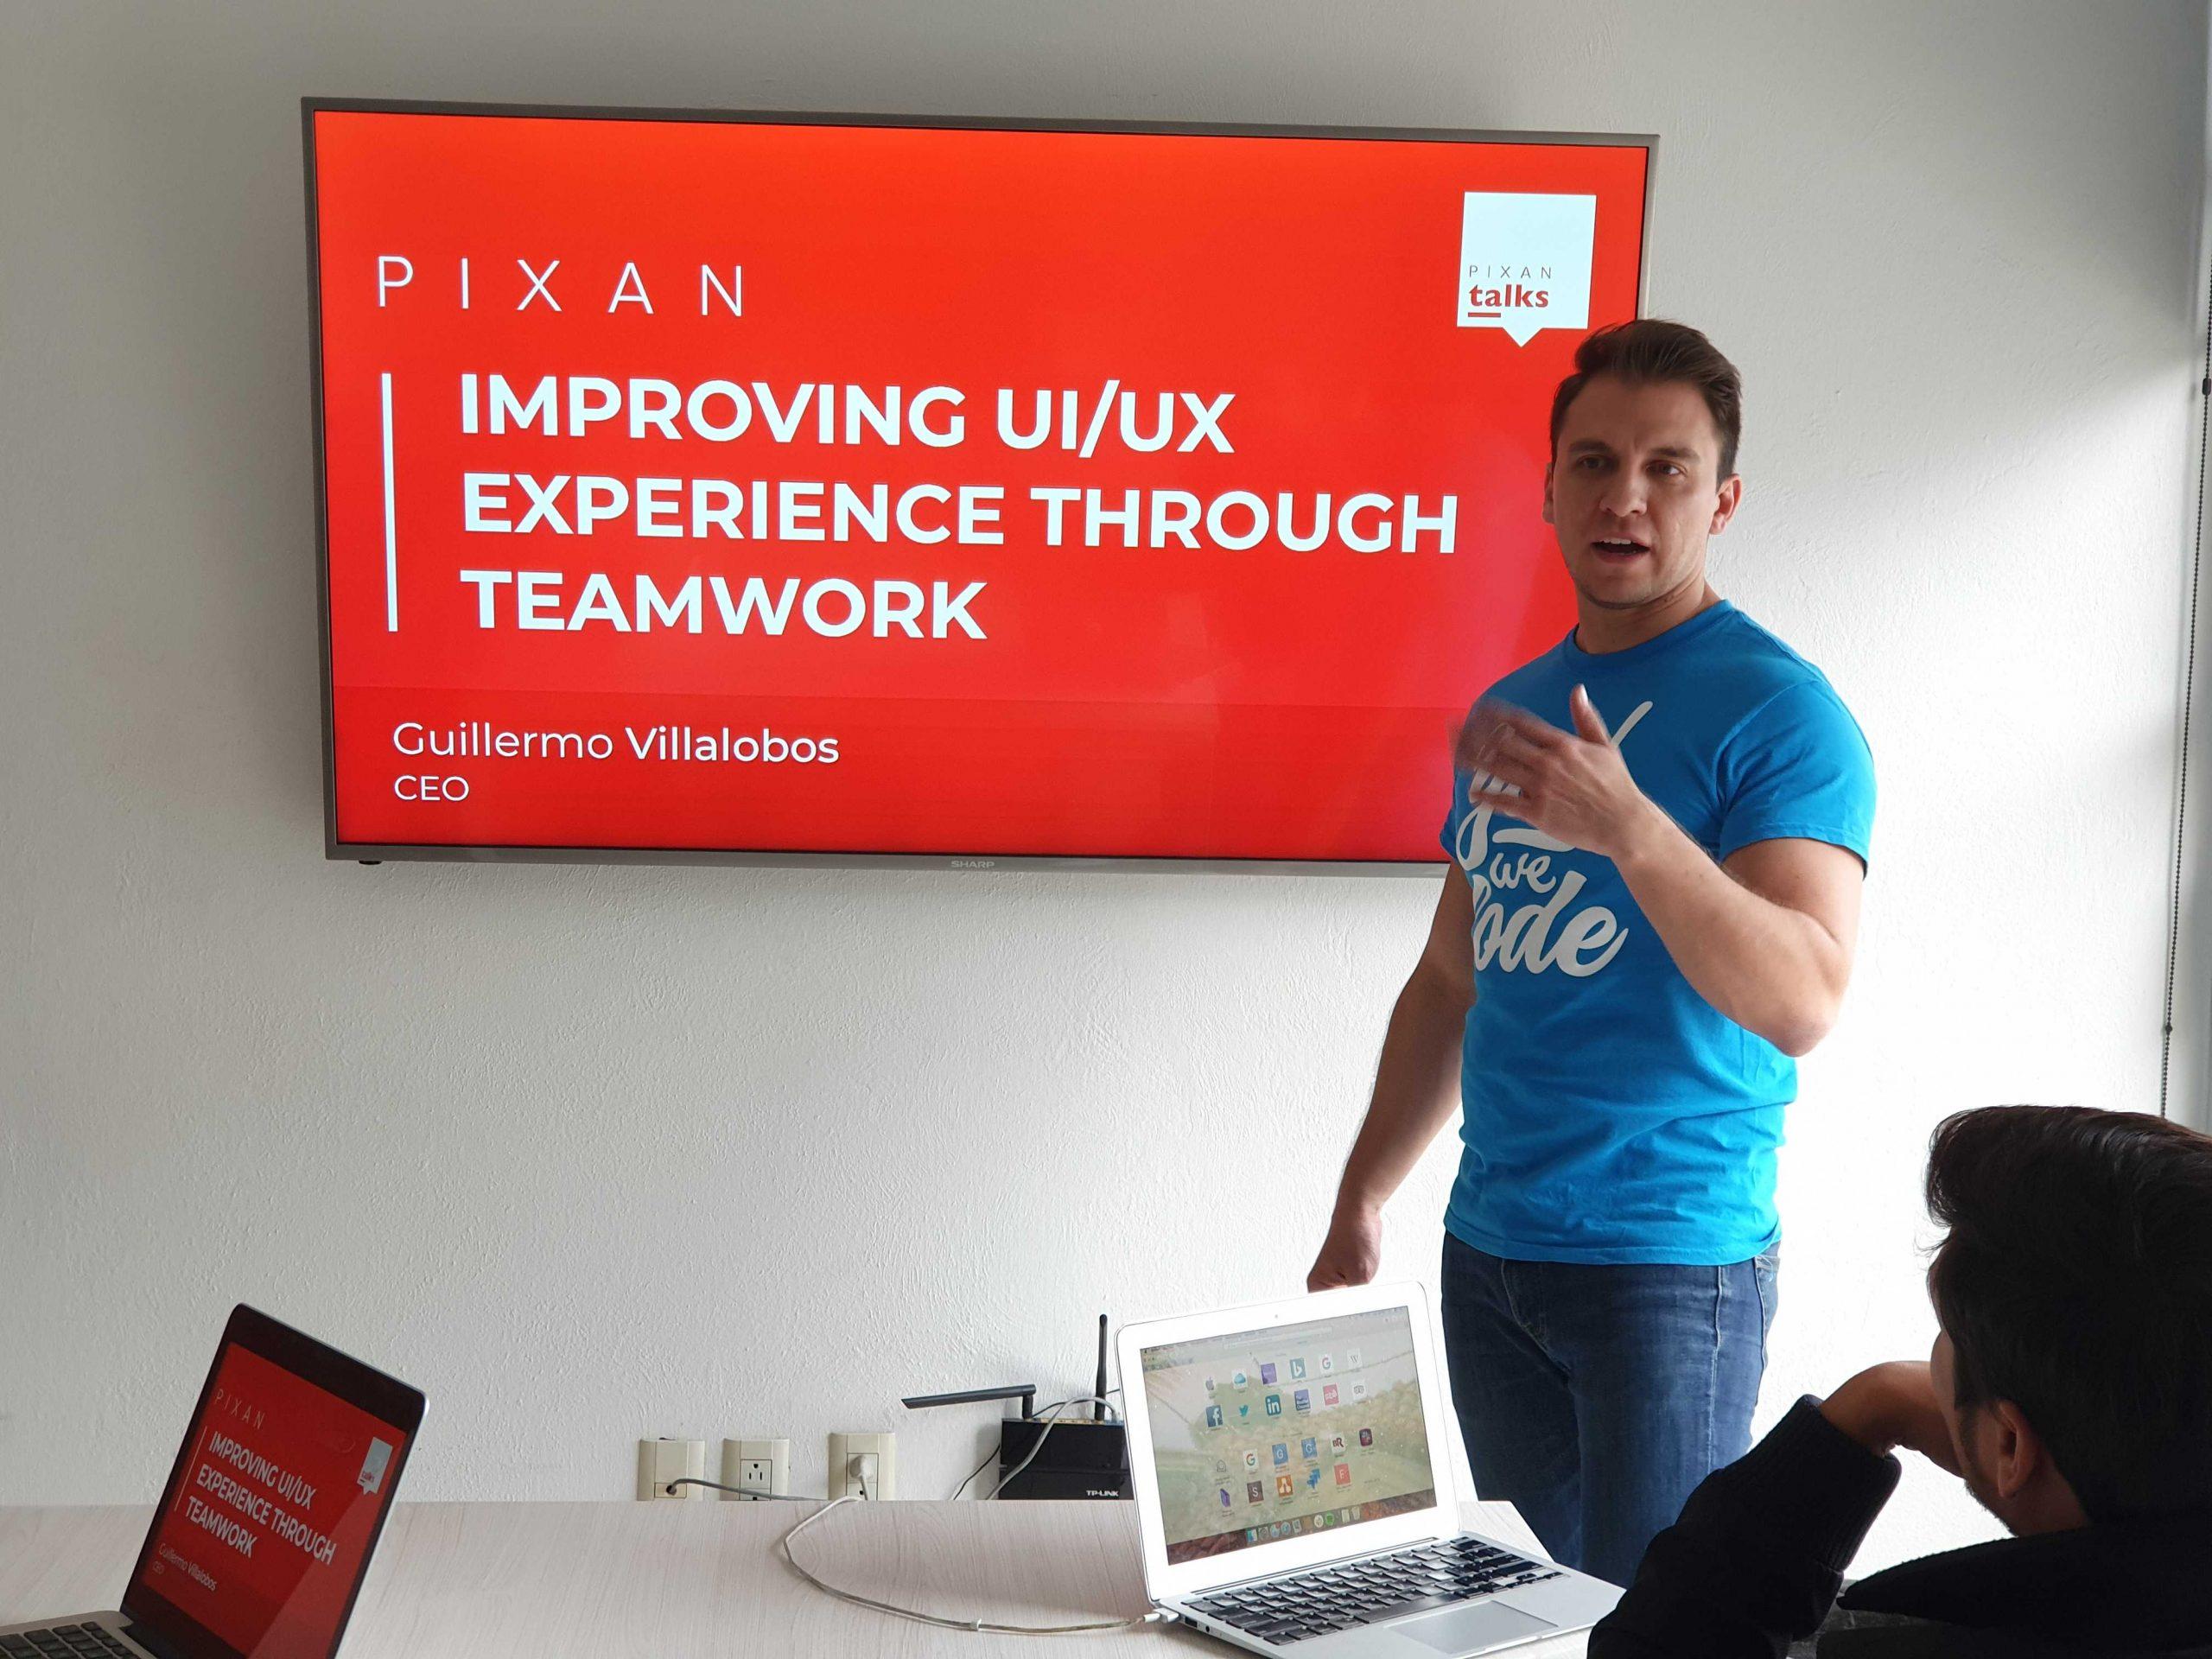 Improving UI/UX EXPERIENCE THROUGH TEAMWORK